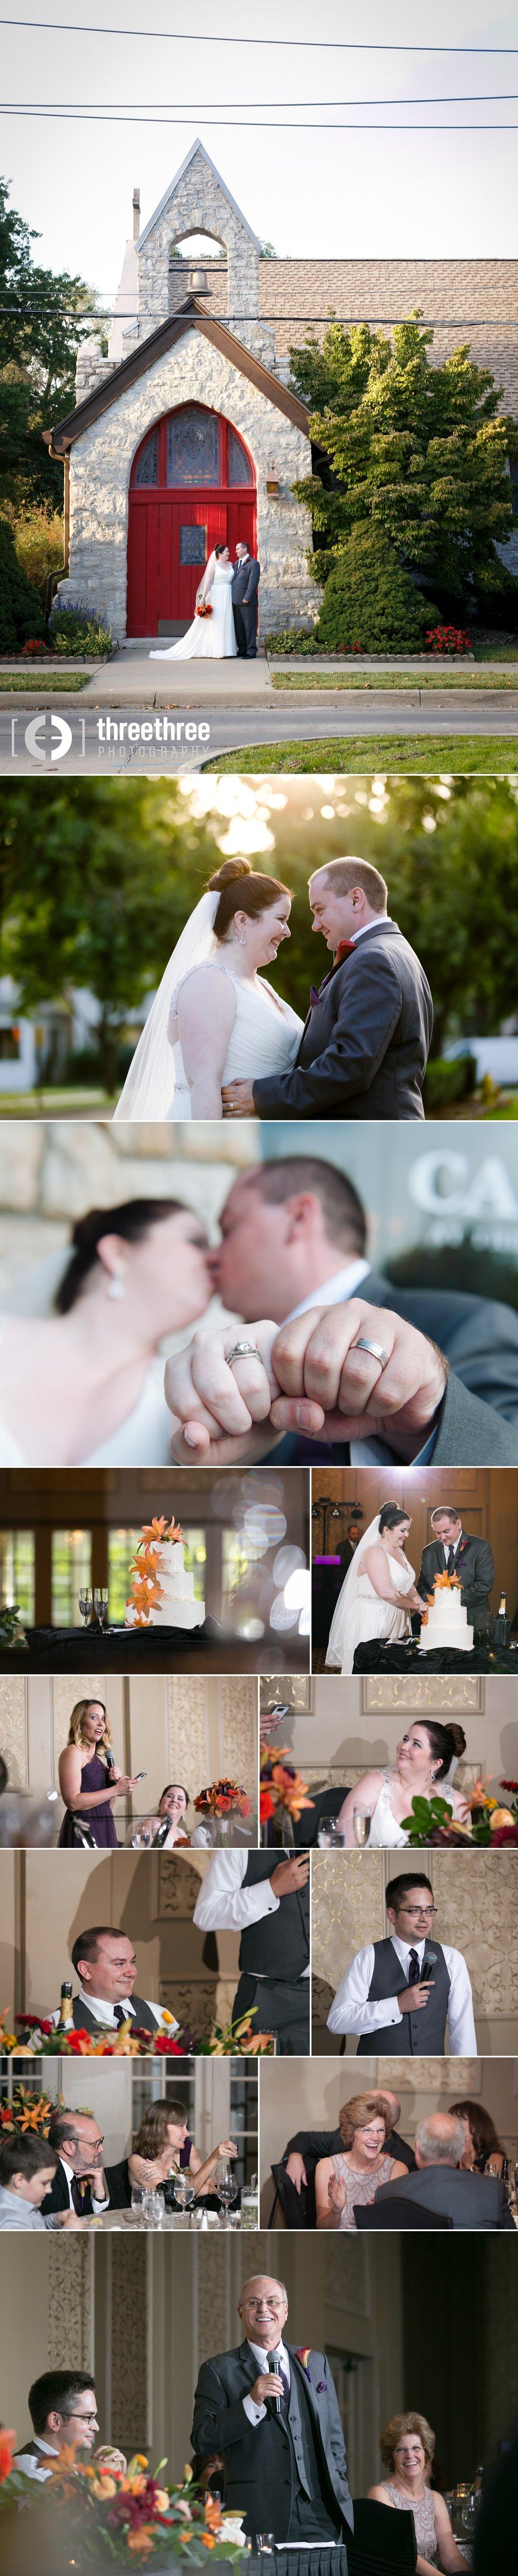 Abby_Will_The Elms Hotel Wedding 6.jpg